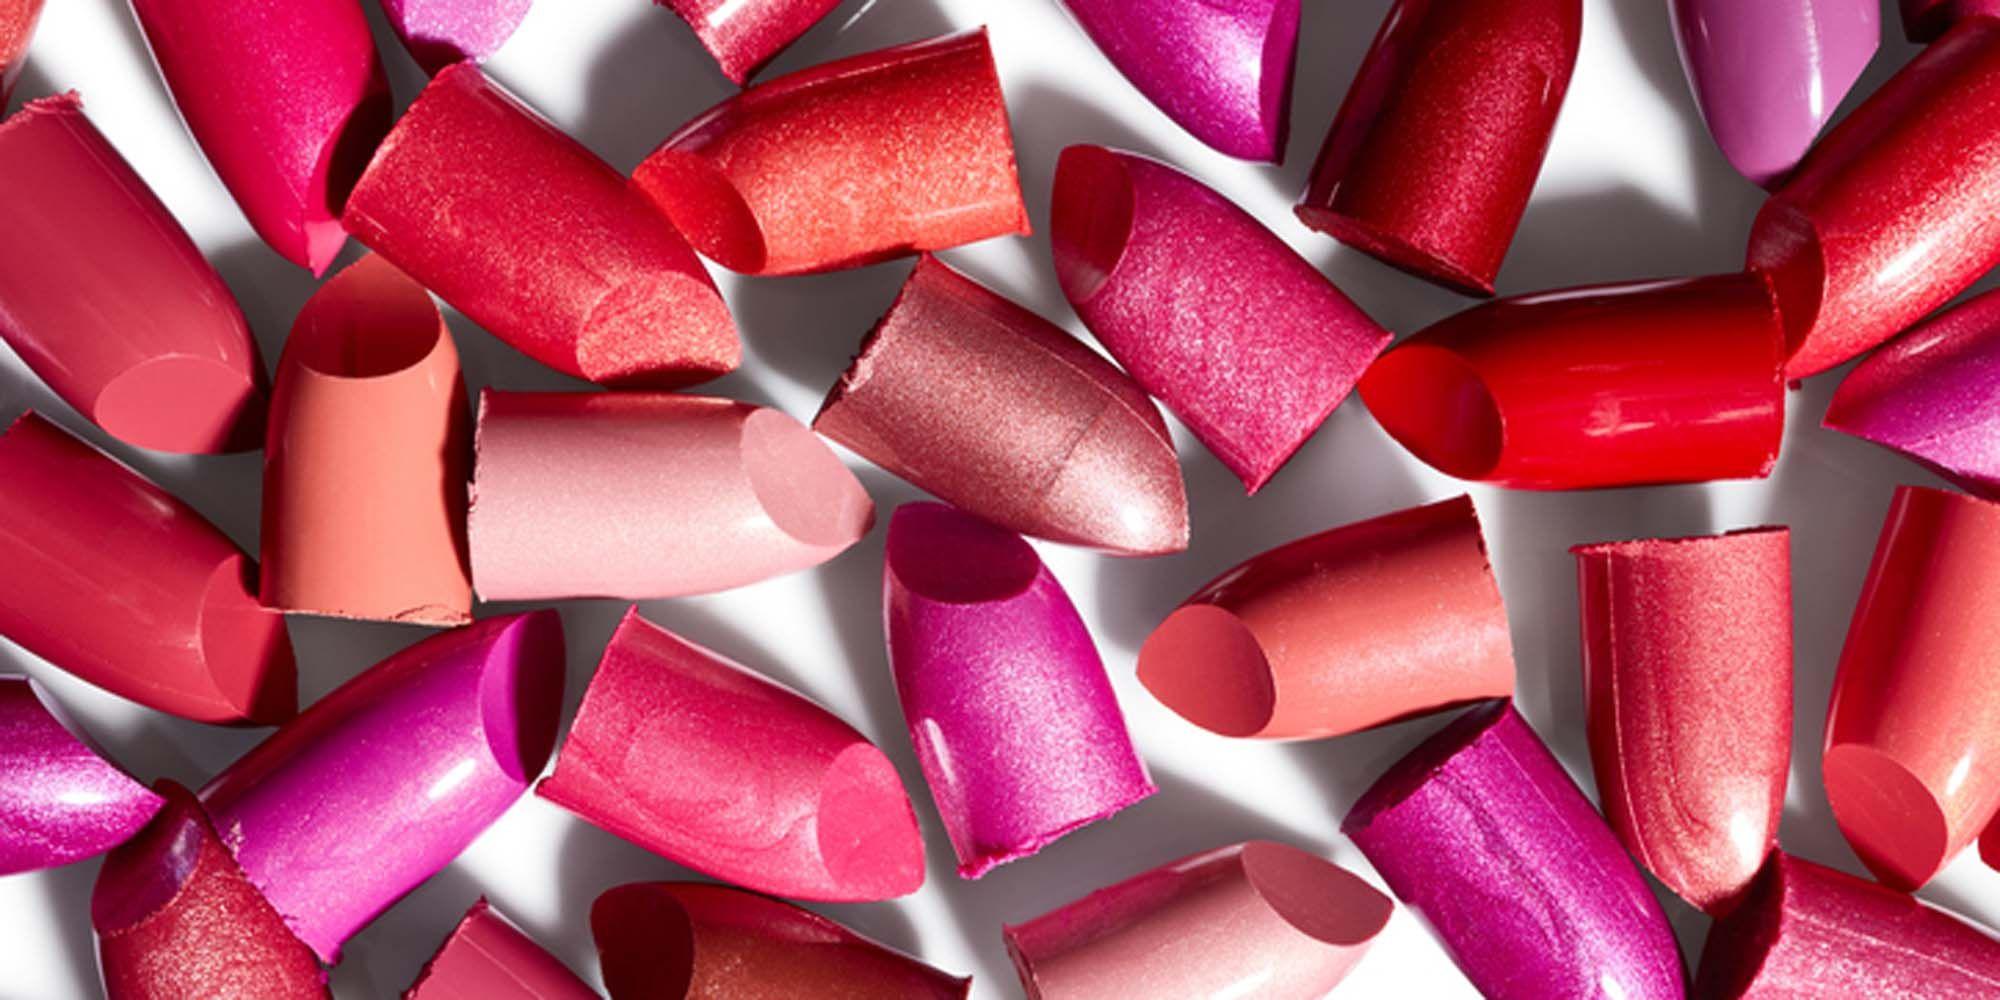 beste lippenstift, beste lipstick, beste lipstick merk, beste lipstick merken, beste lippenstift merken, beste lipsticks, favoriete lipsticks,